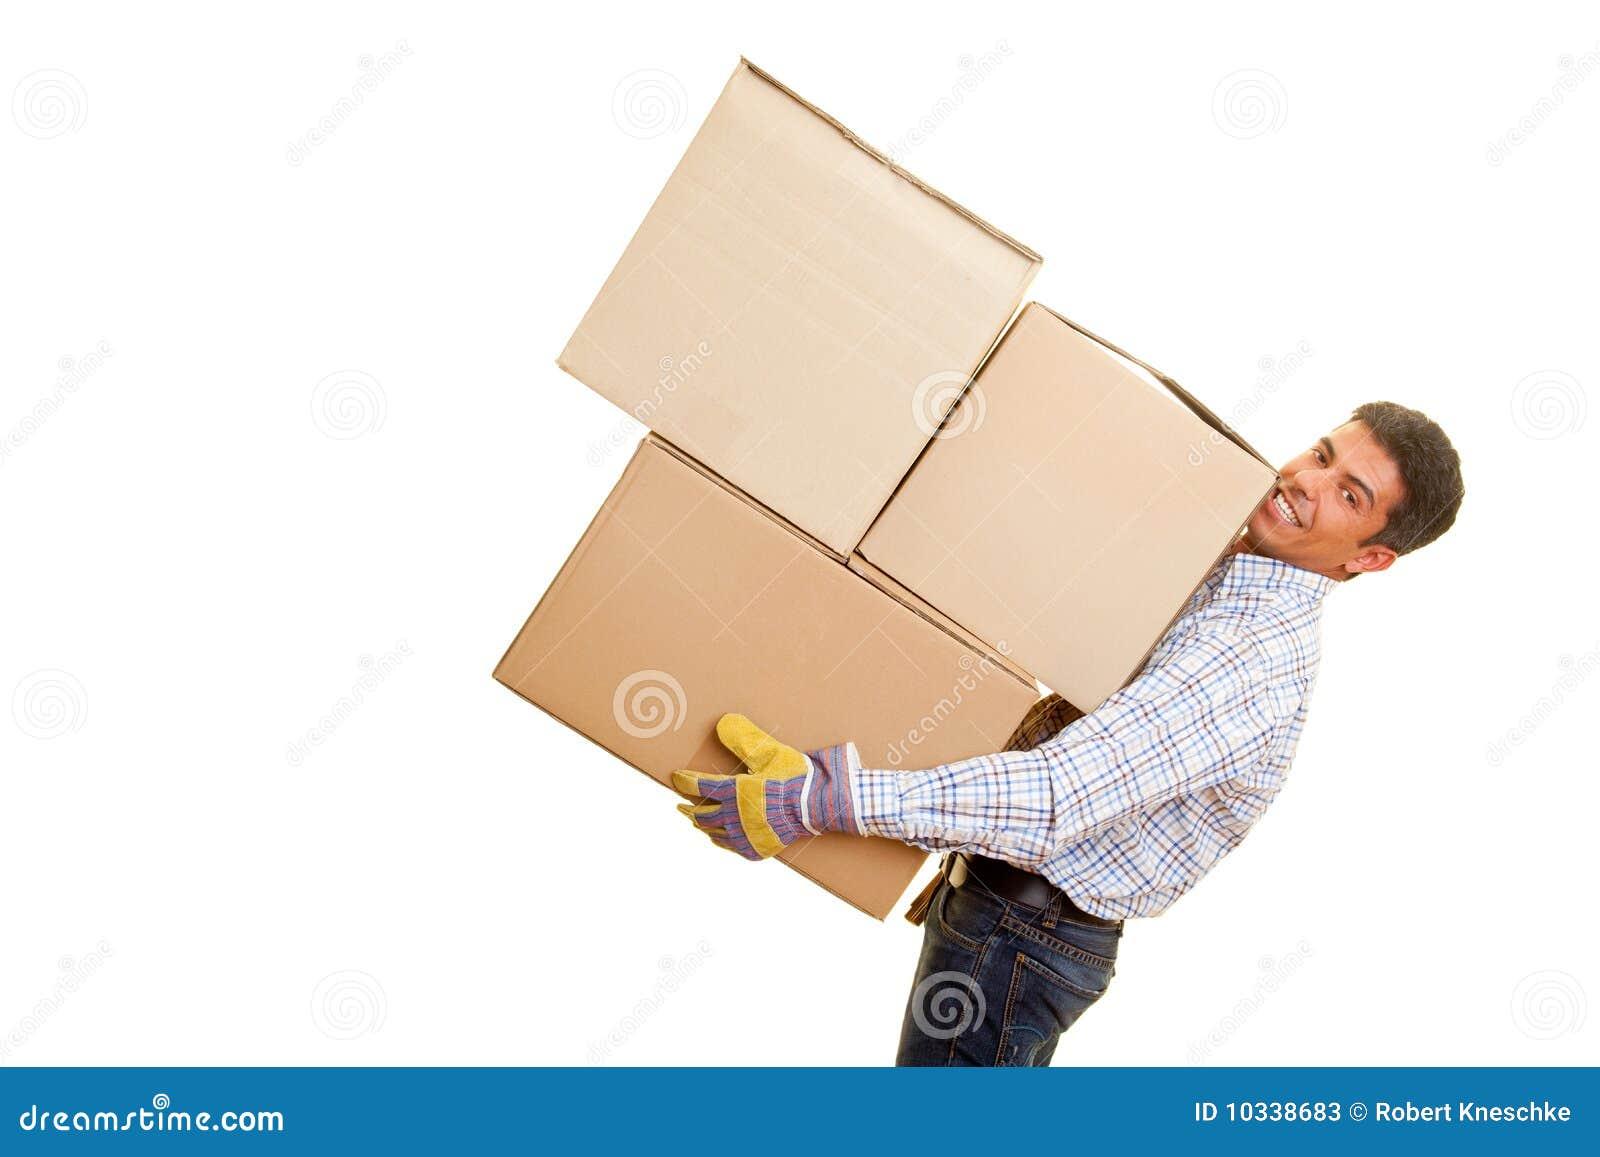 Heavy Boxes Stock Photos - Image: 10338683